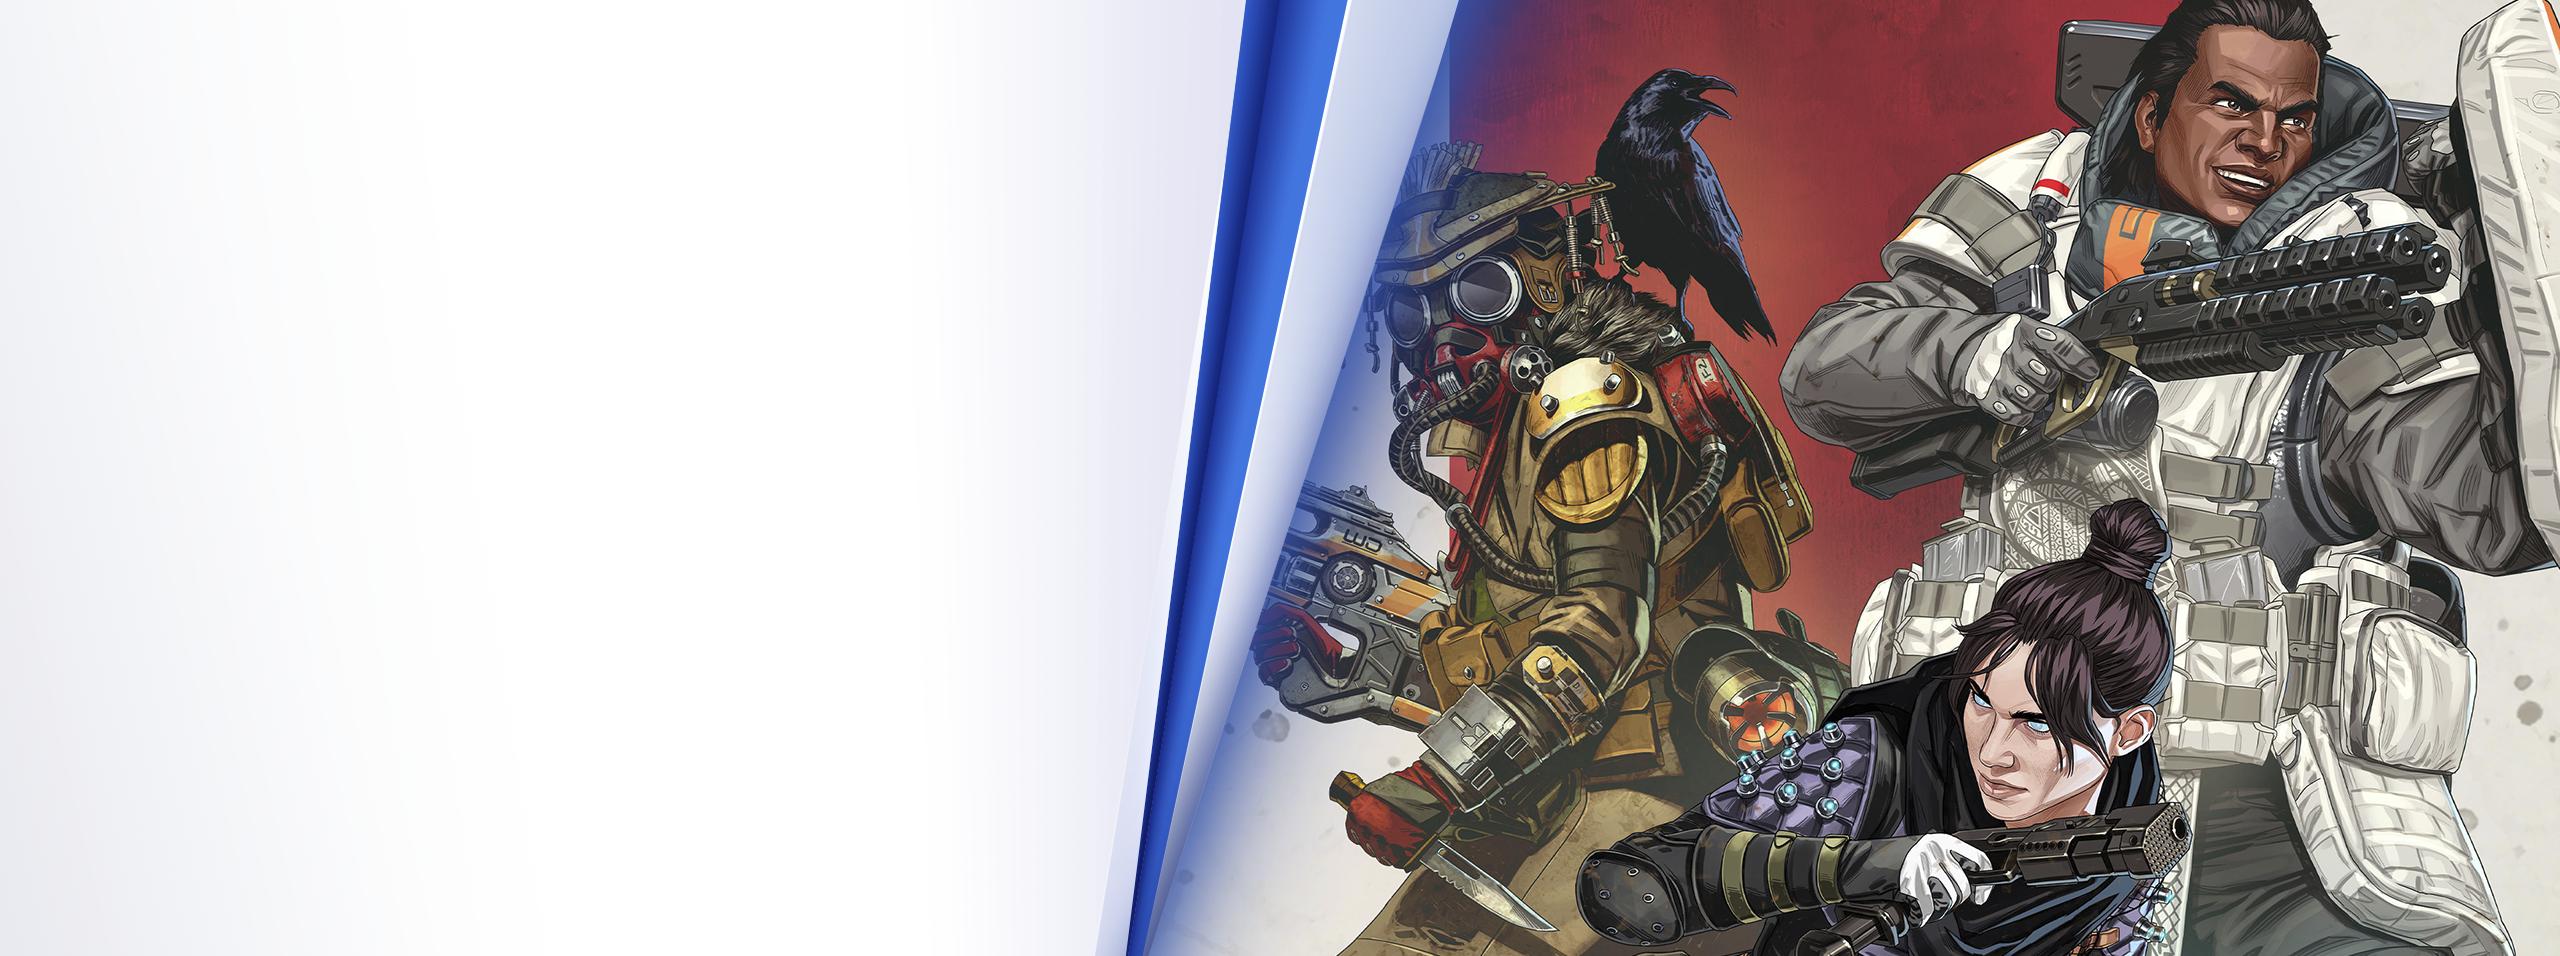 PlayStation Tournaments: Apex Legends - Key Art